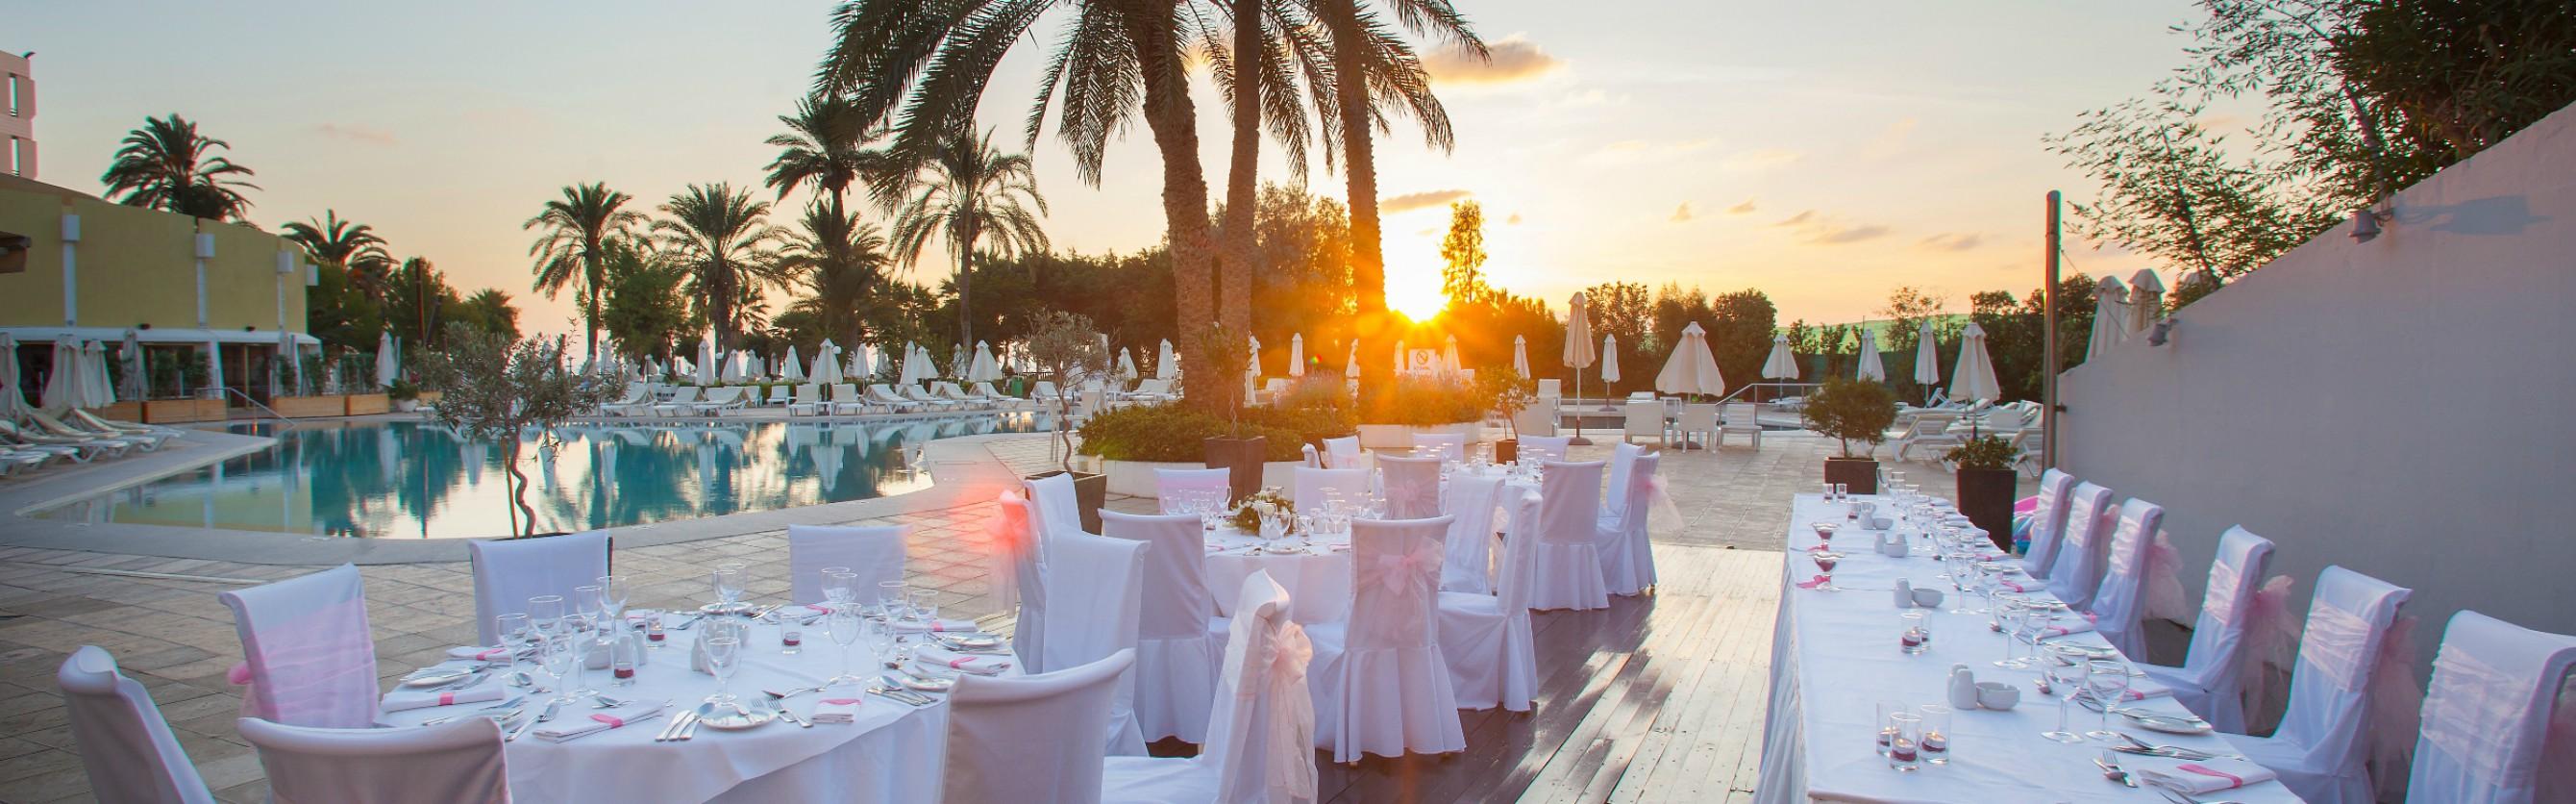 Hotel Louis Imperial Beach Wedding